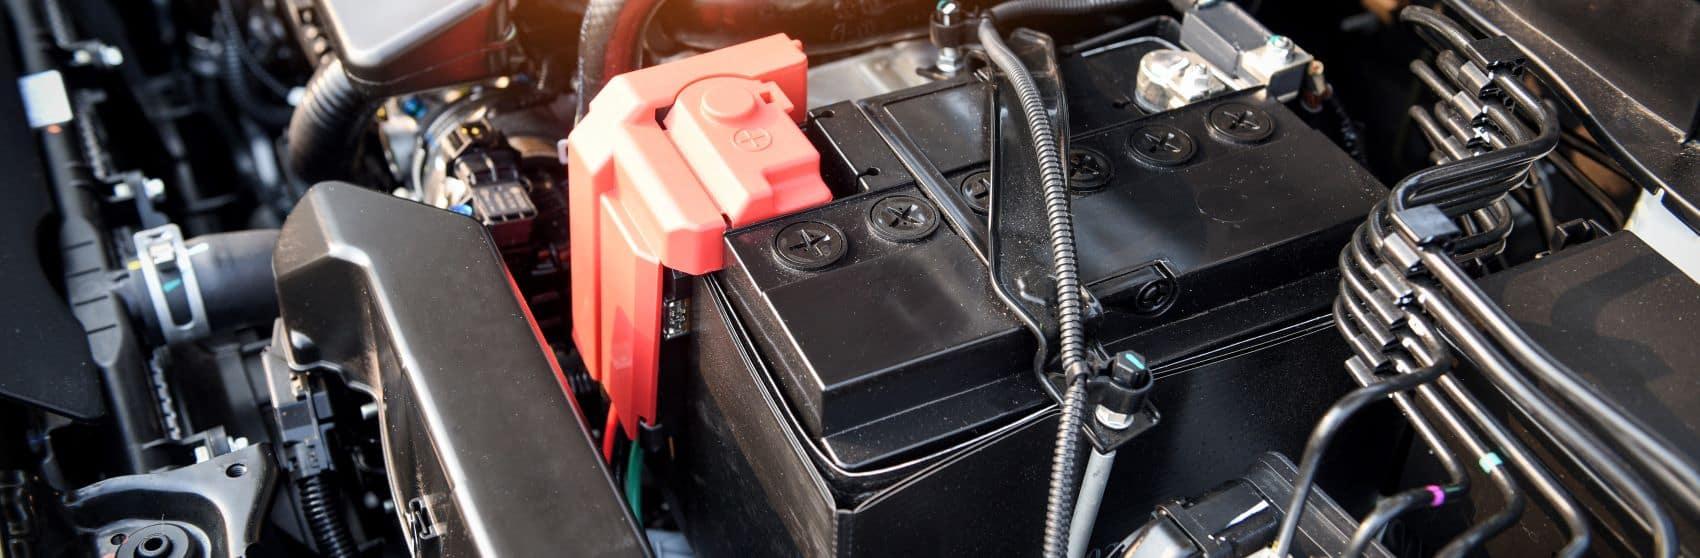 Car battery under the hood of a car